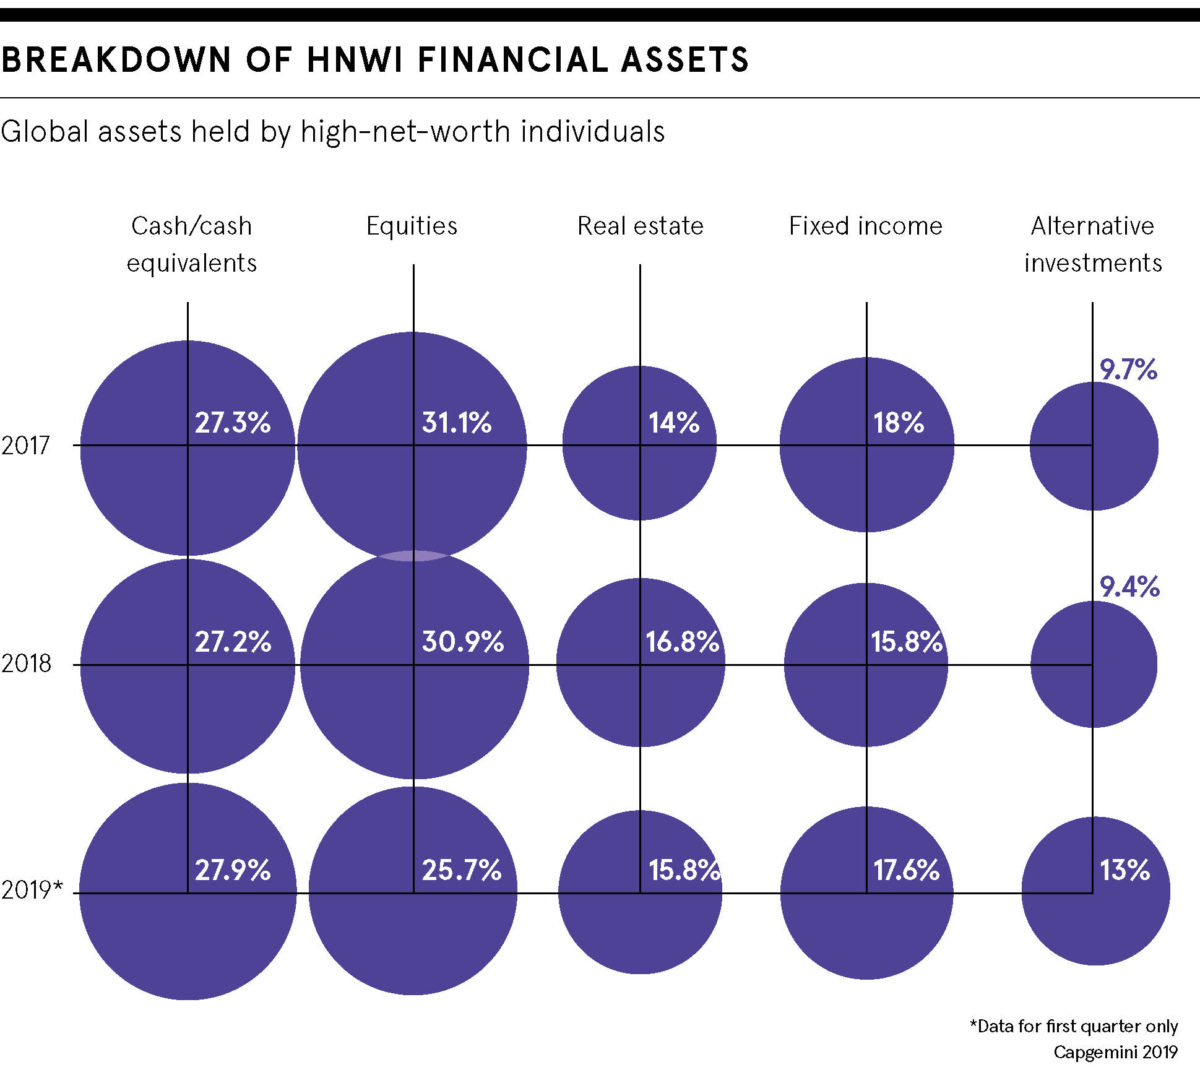 HNWI Fnancial Assets